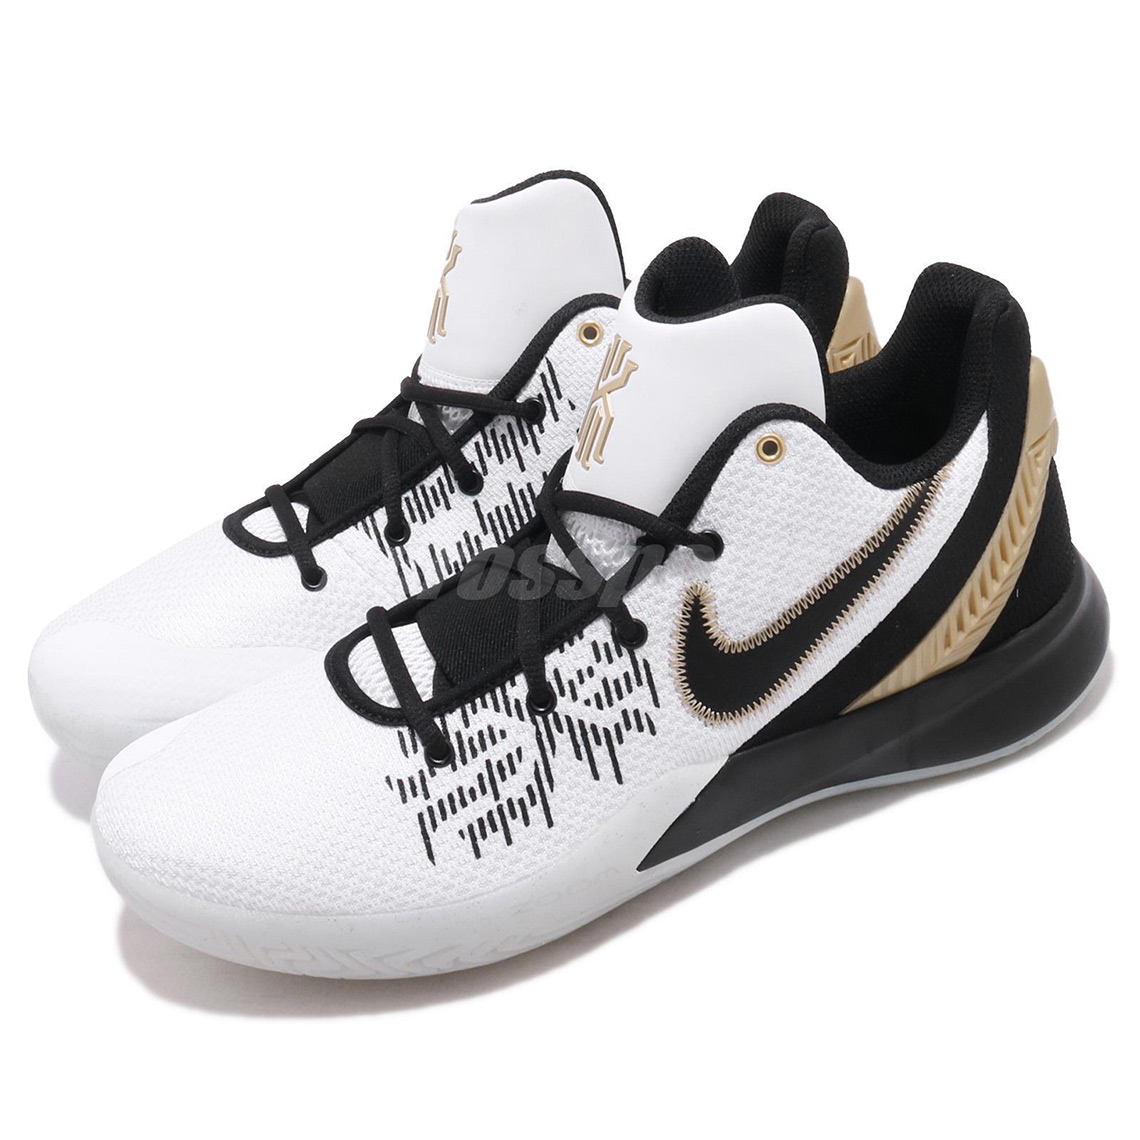 uk availability 0ff67 fb9a7 Nike Kyrie Flytrap 2 Release Info | SneakerNews.com